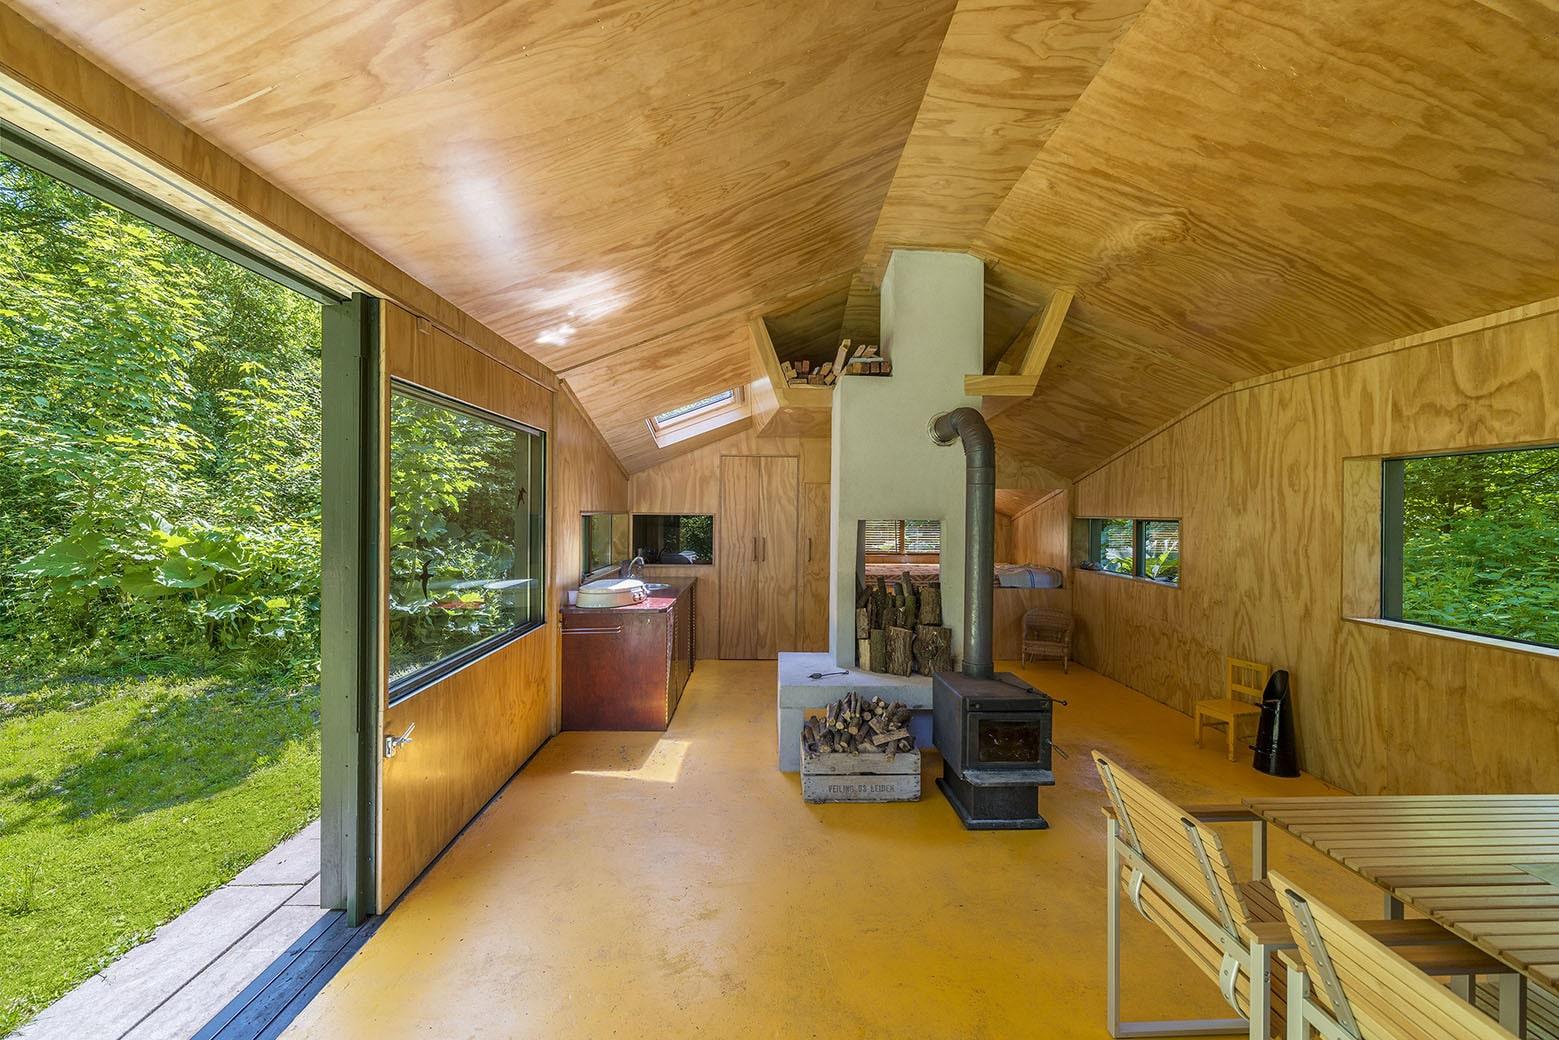 Dise o de caba a peque a de 35 metros cuadrados - Interior casas de madera ...